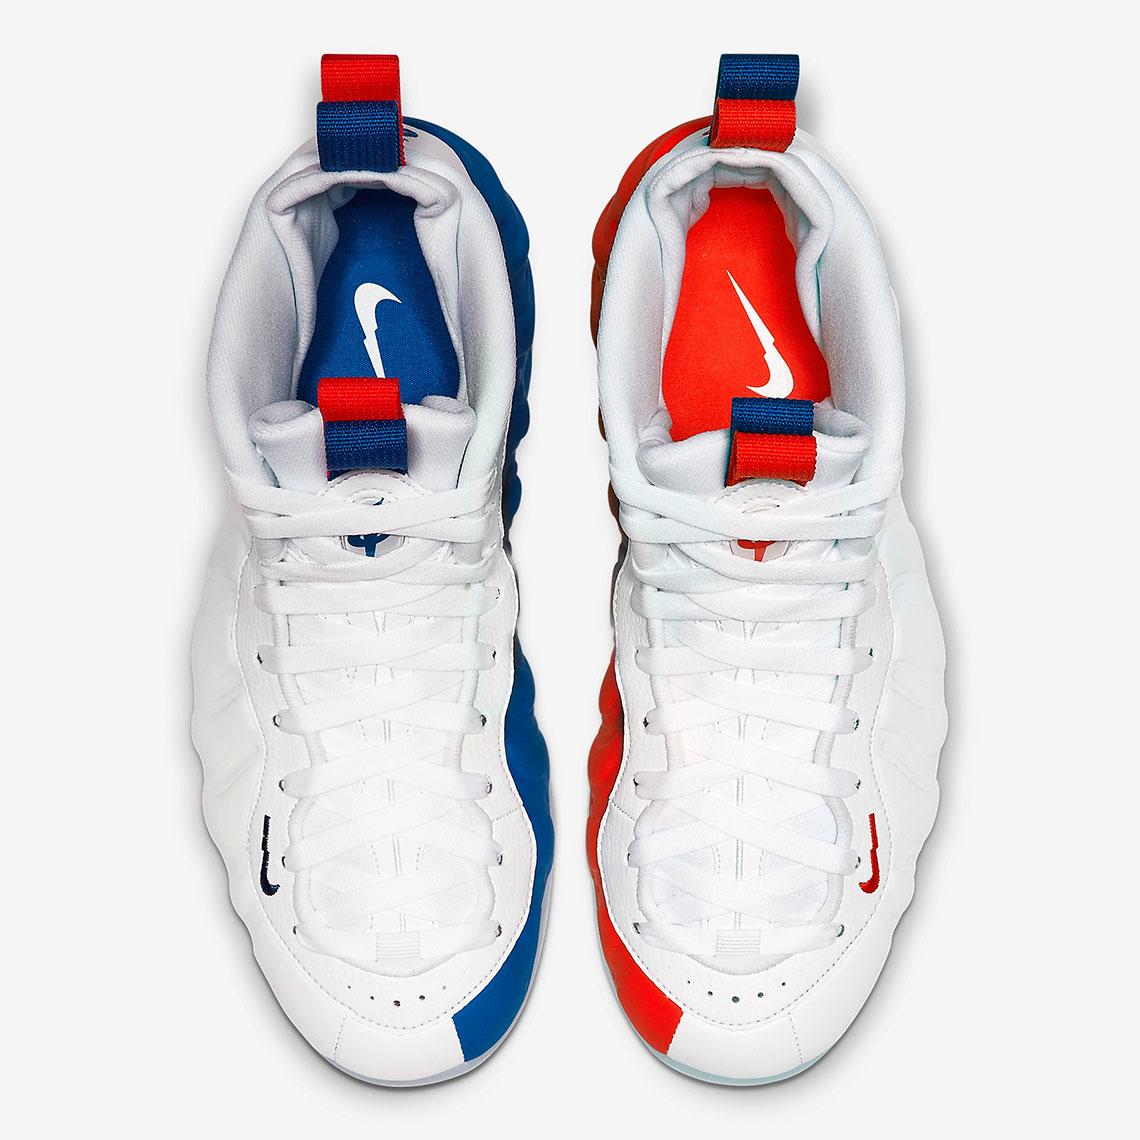 Nike Air Foamposite One Flash Custom Nice Kicks